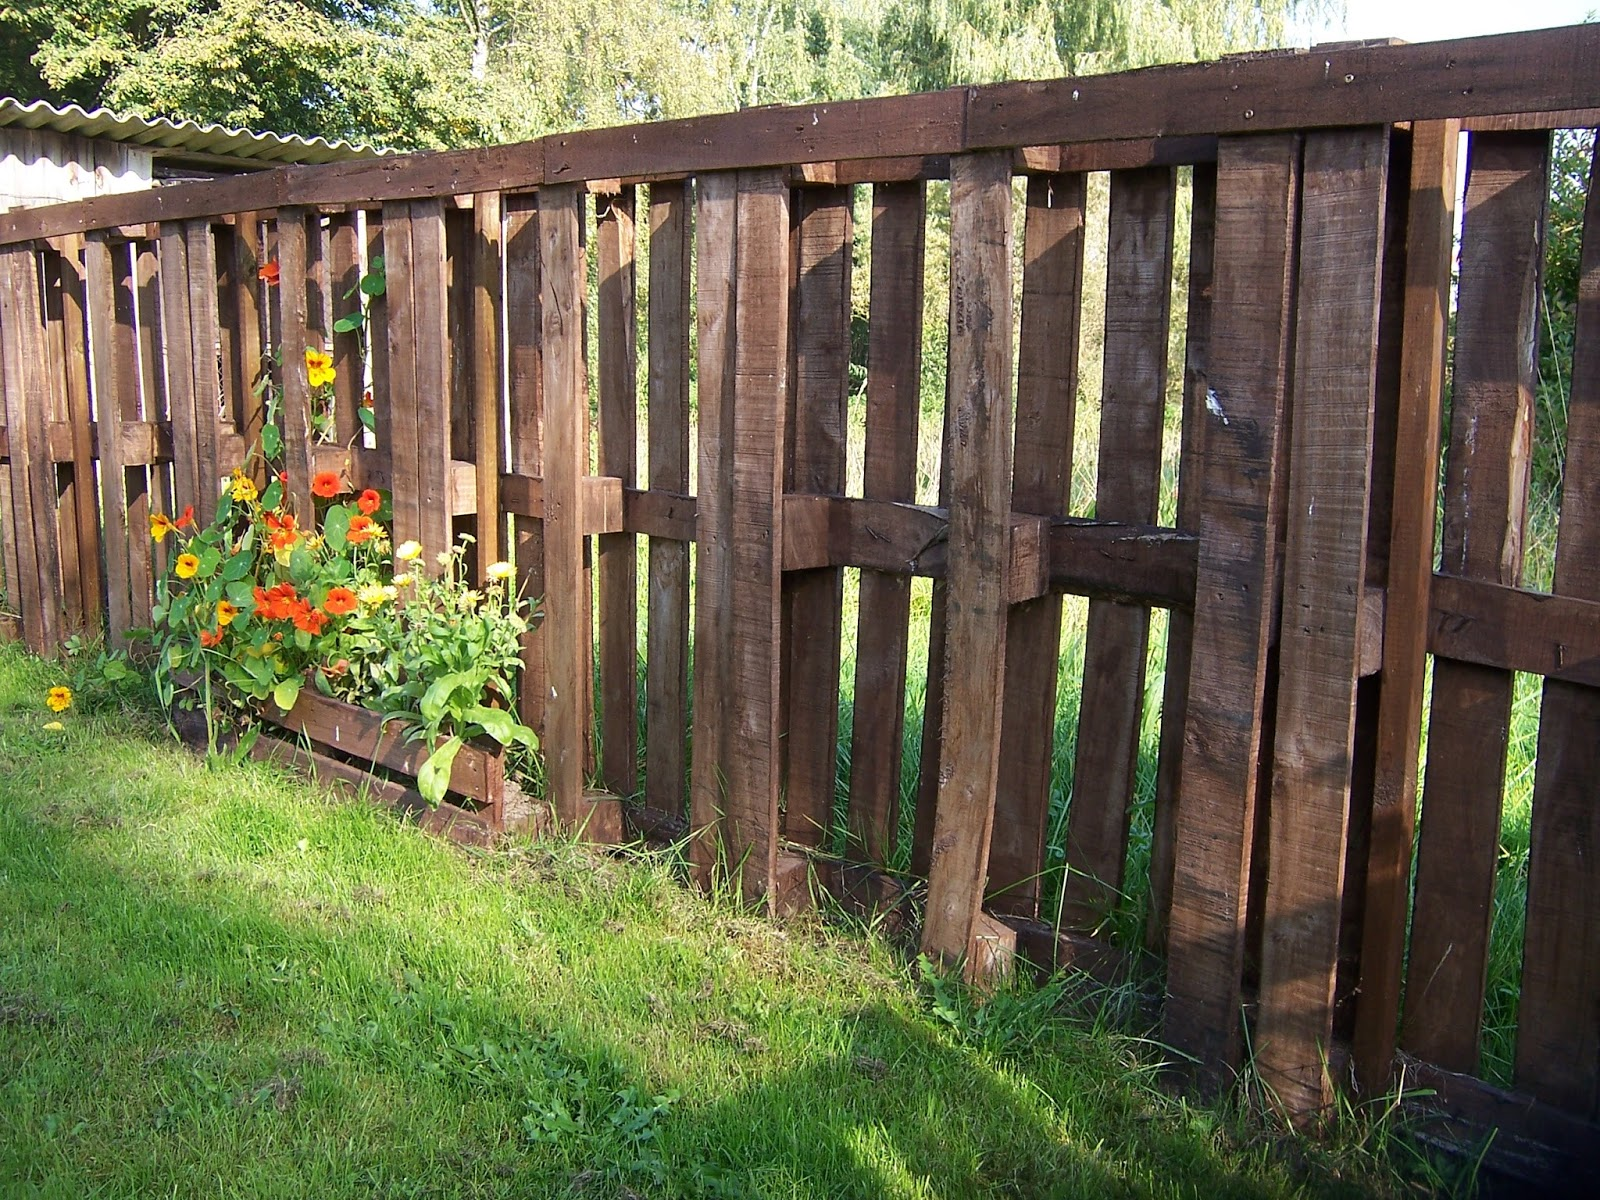 Zaun Gunstig Zaun Gunstig Selbst Bauen Gartenzaun Selbst Bauen